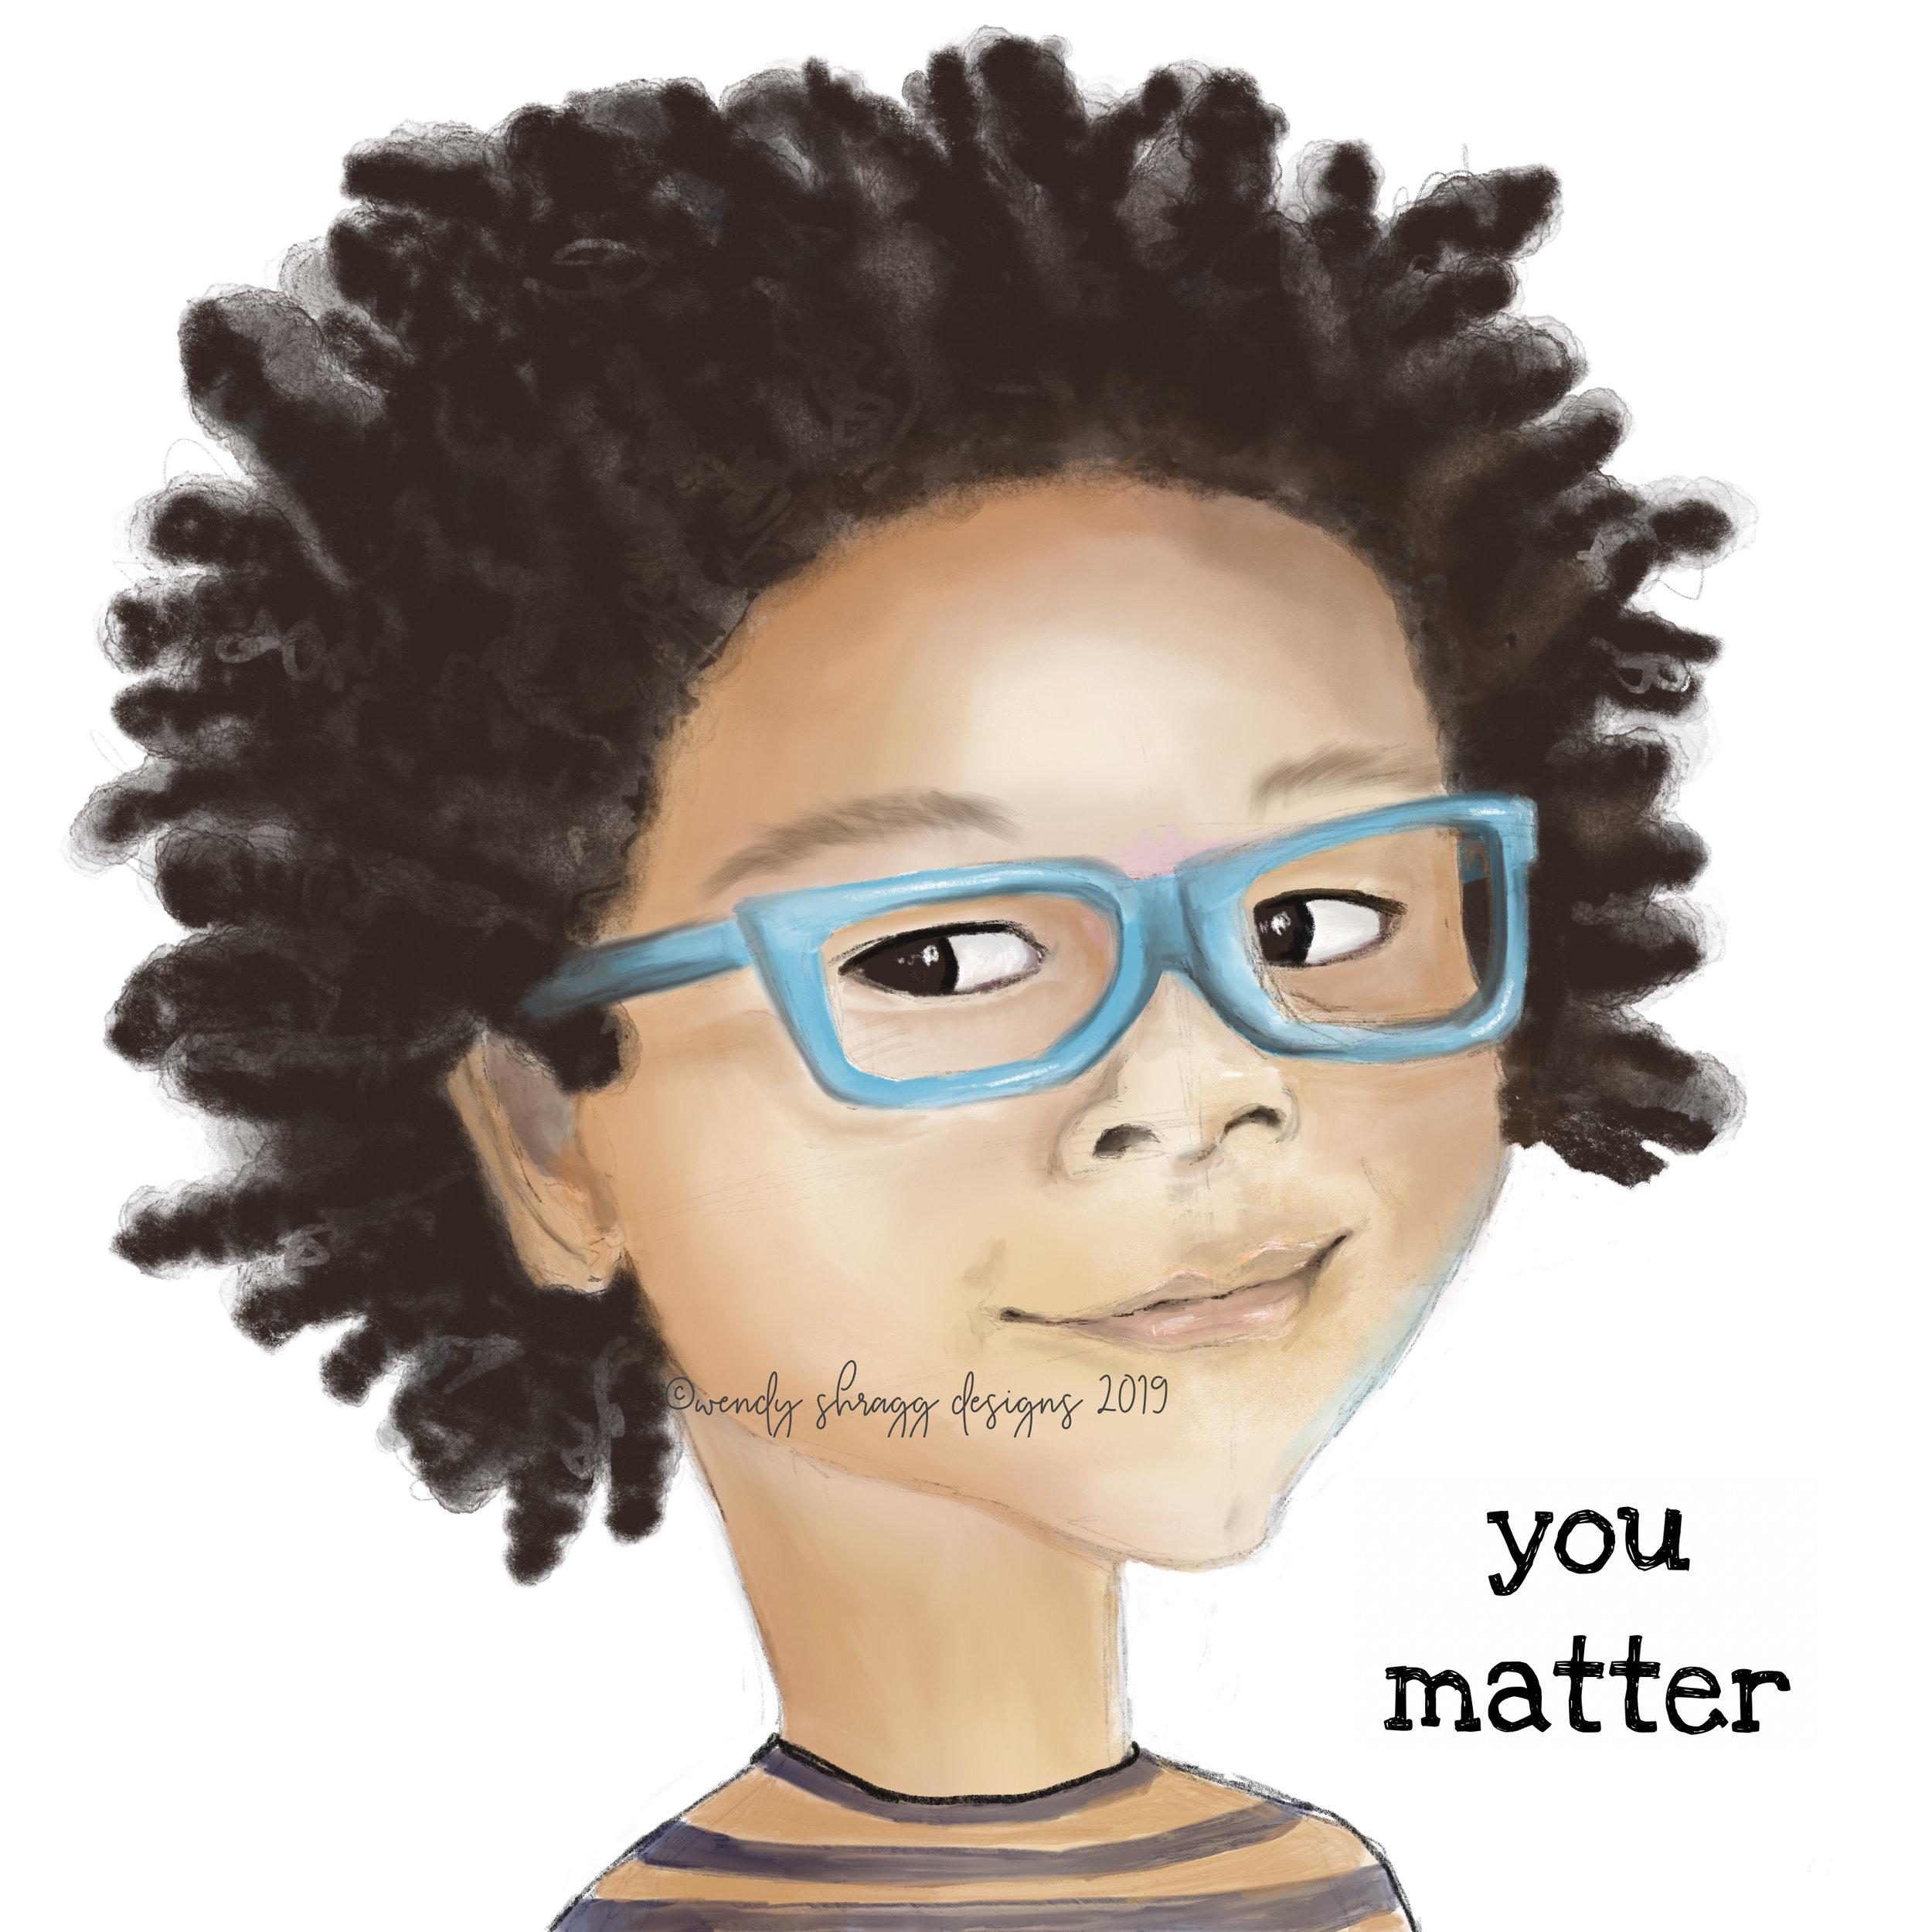 You Matter Isaiah copy.jpg